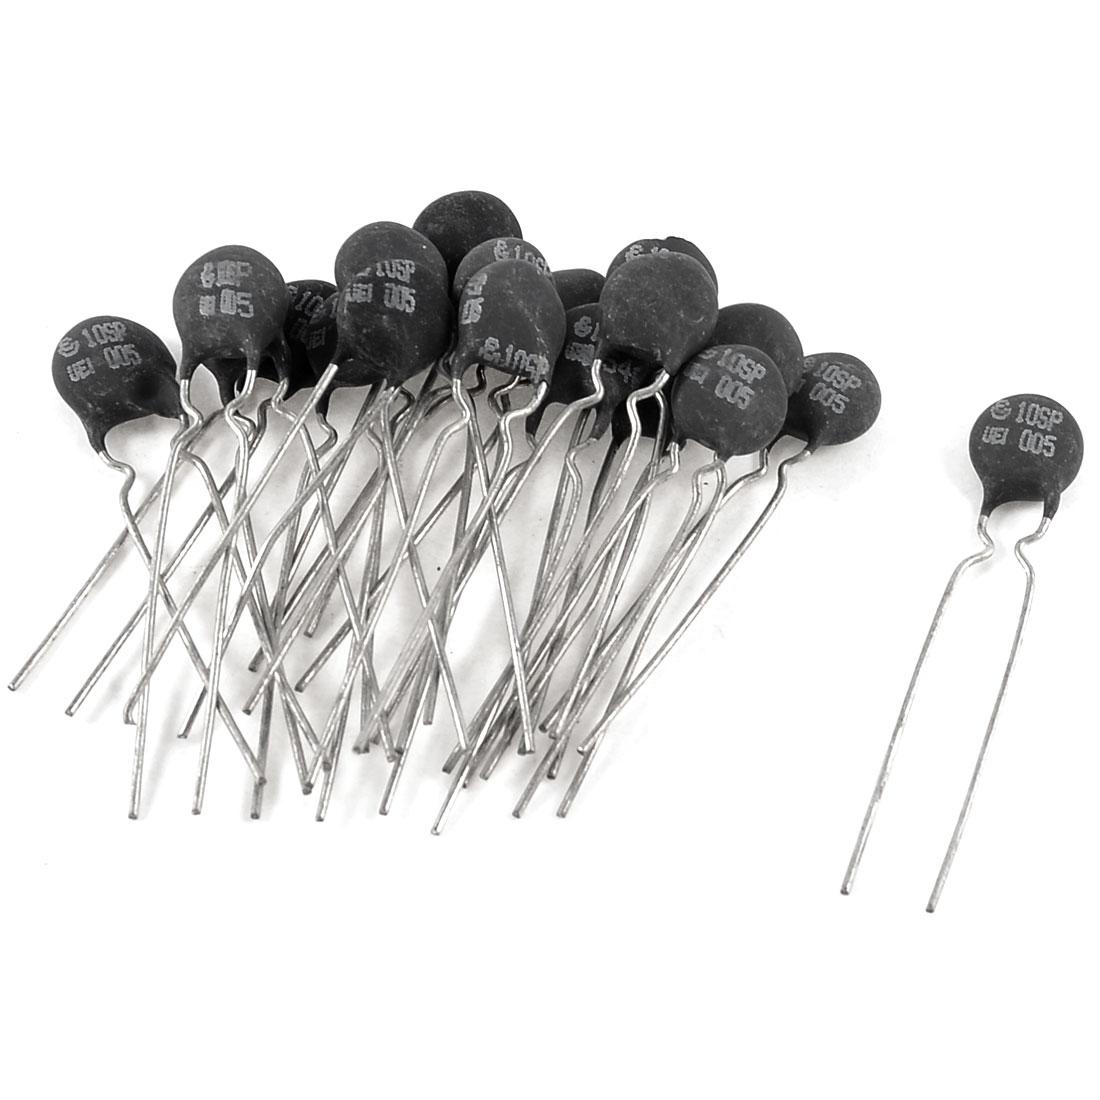 "1.5mm Pitch NTC Thermistors 1.9"" Long Black Silver Tone 5 Ohm 20 Pcs"